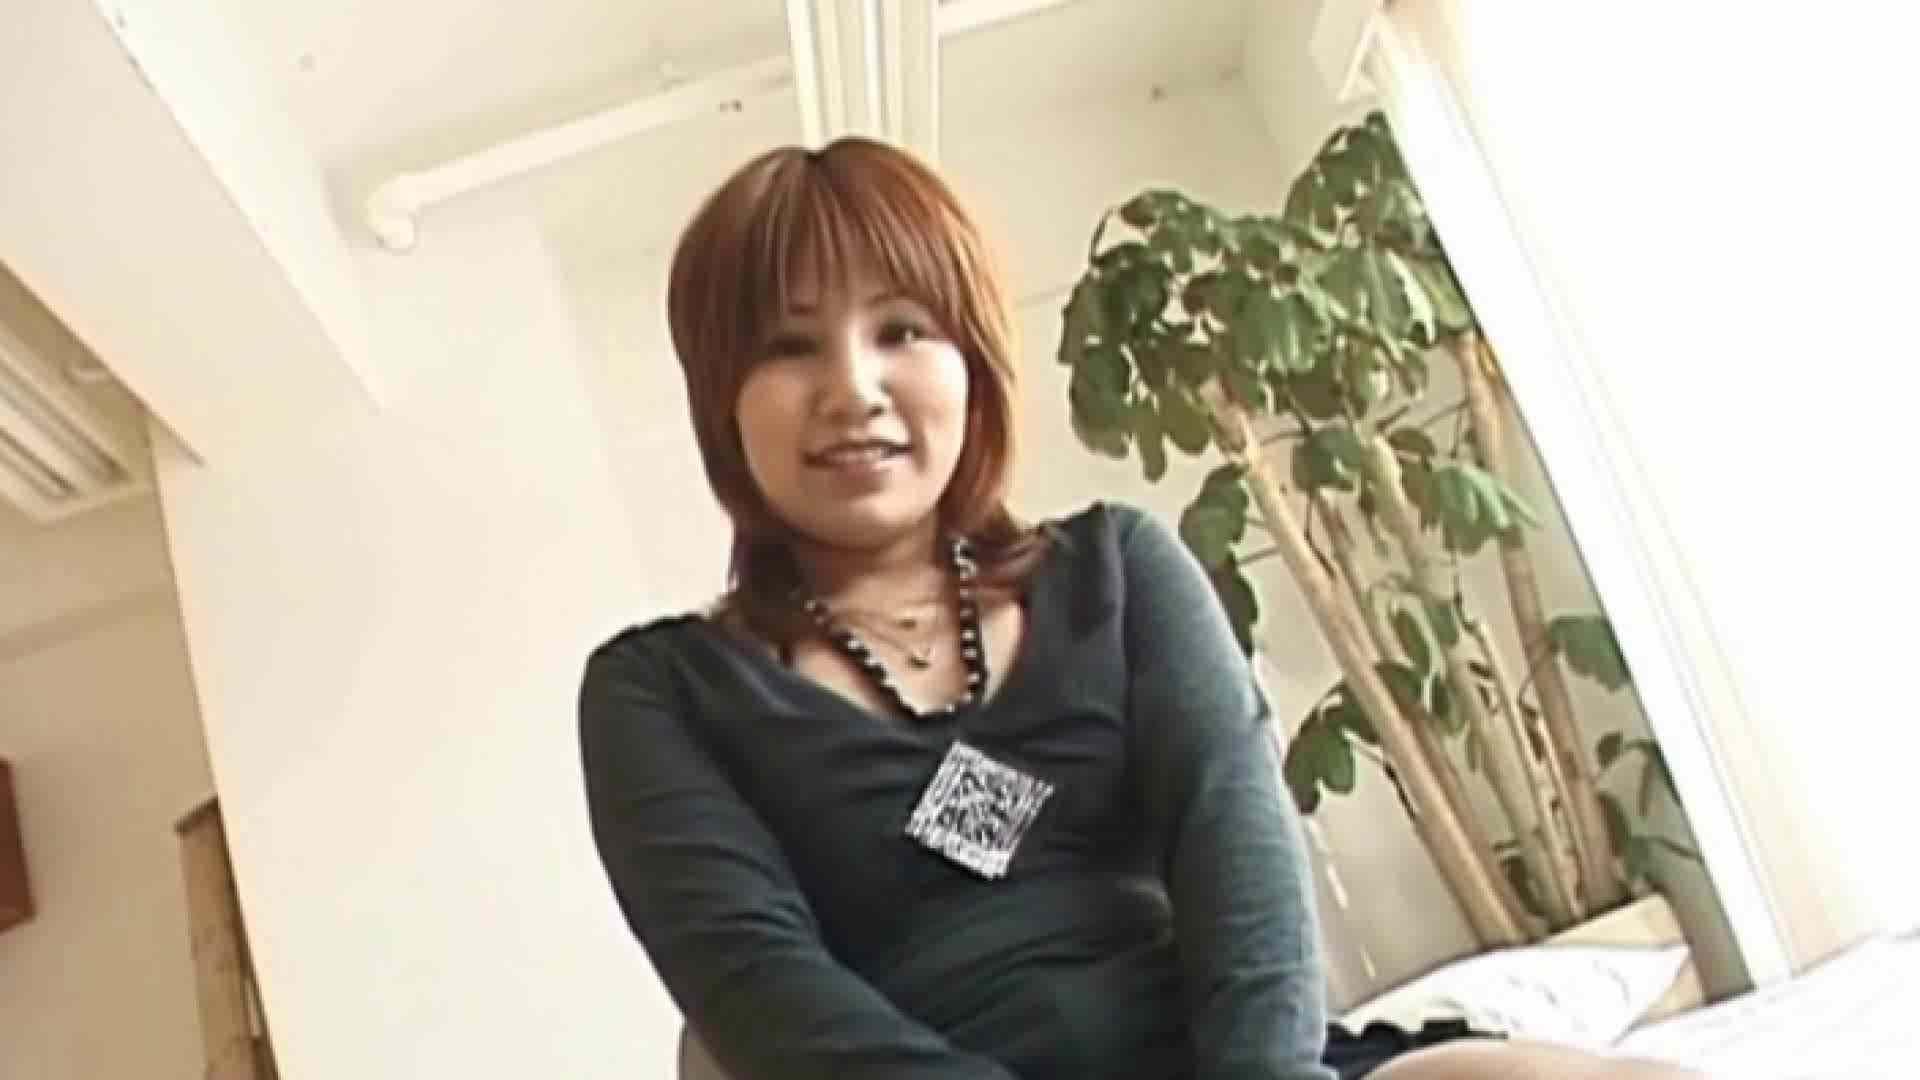 S級厳選美女ビッチガールVol.16 美女 | 淫乱  55pic 1